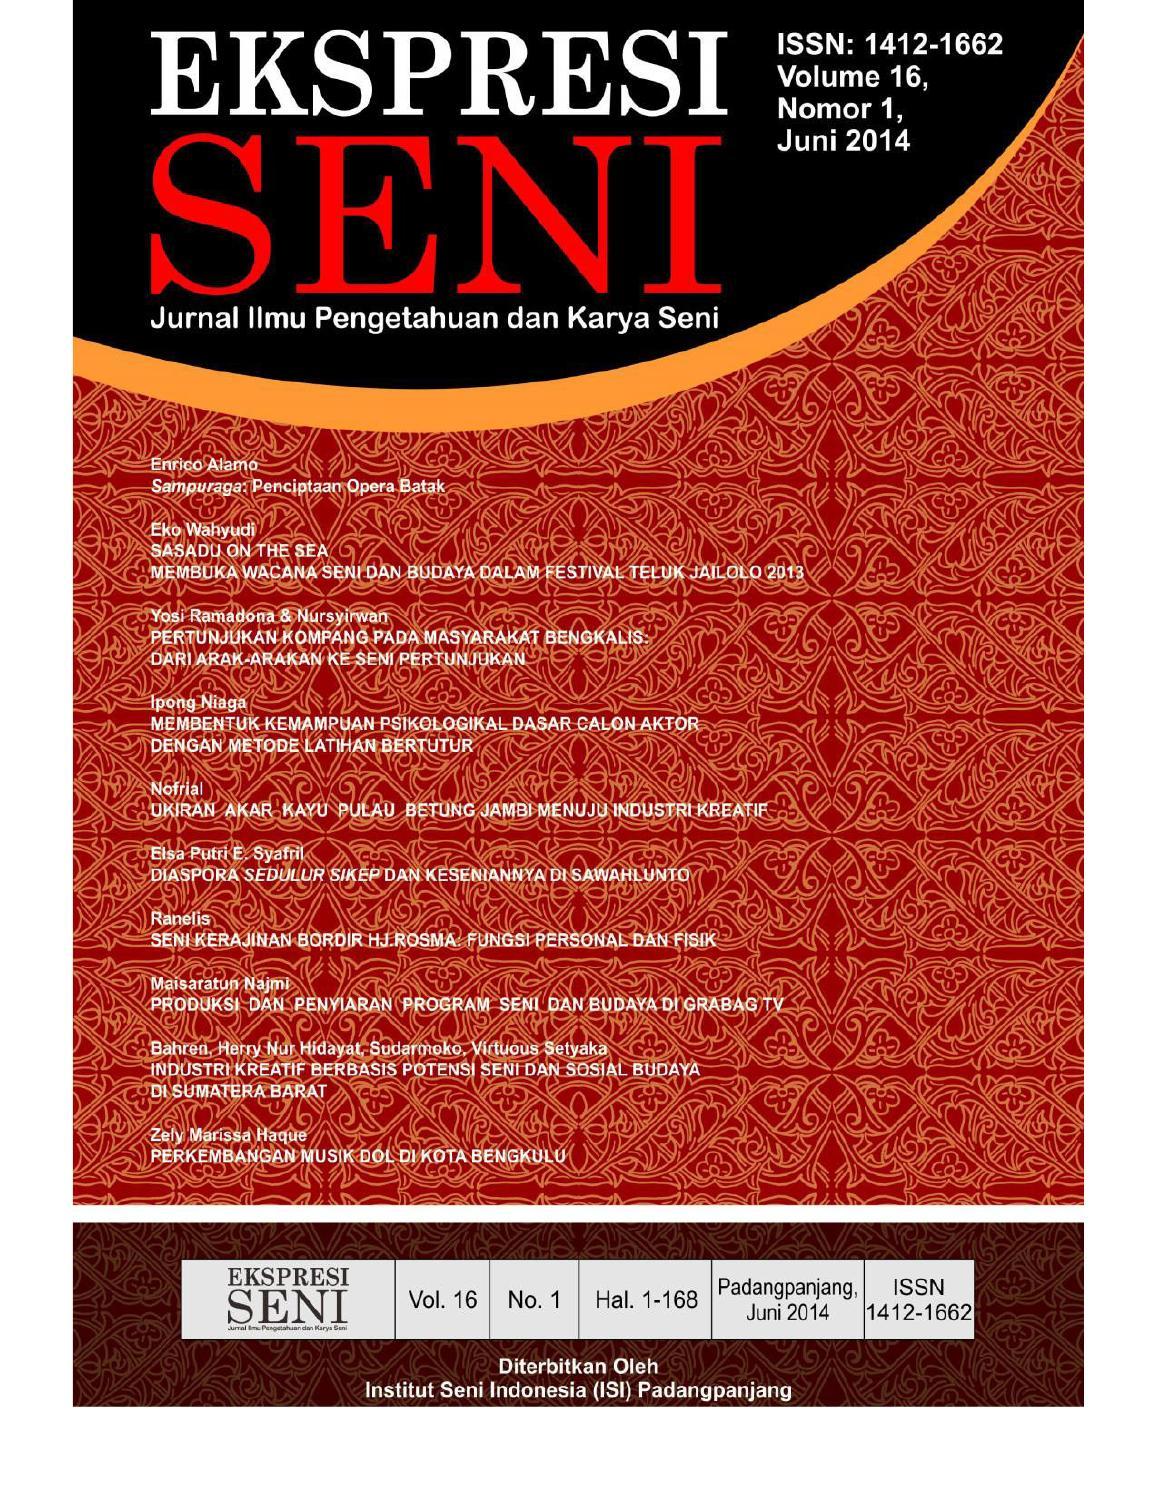 Ekspresi seni vol 16 no 1 juni 2014